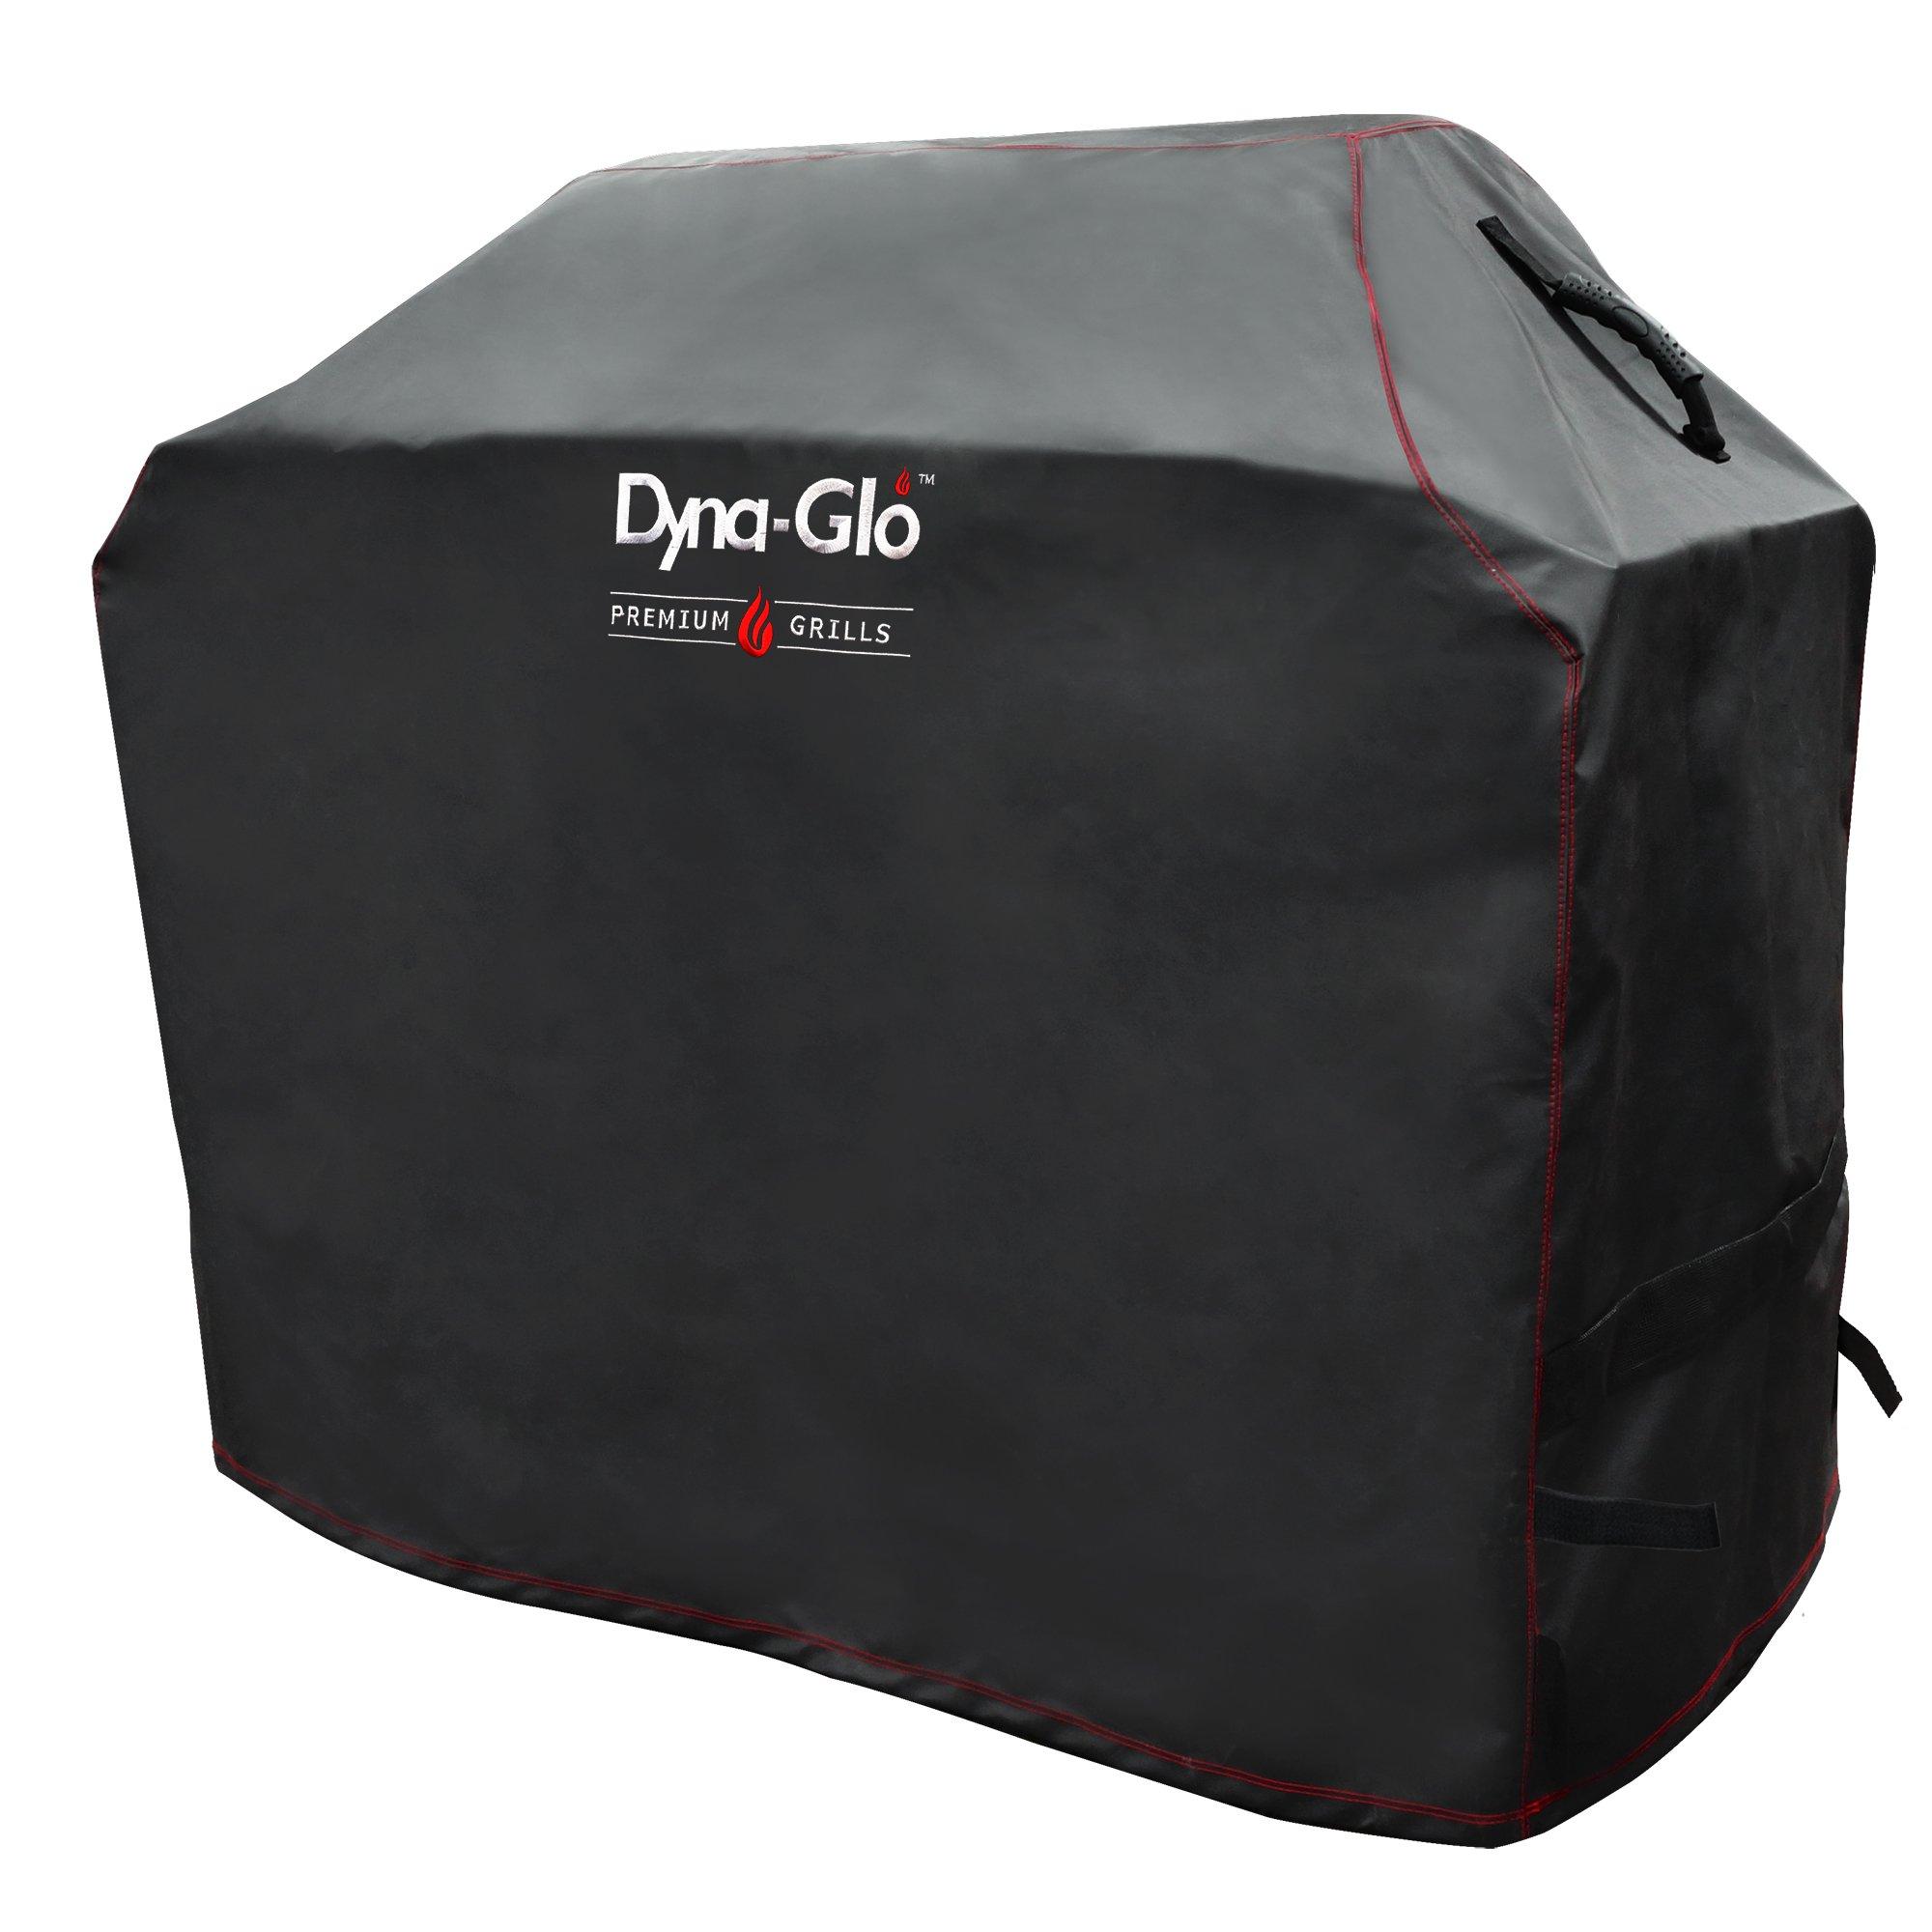 Dyna Glo DG400C Premium Burner Grill